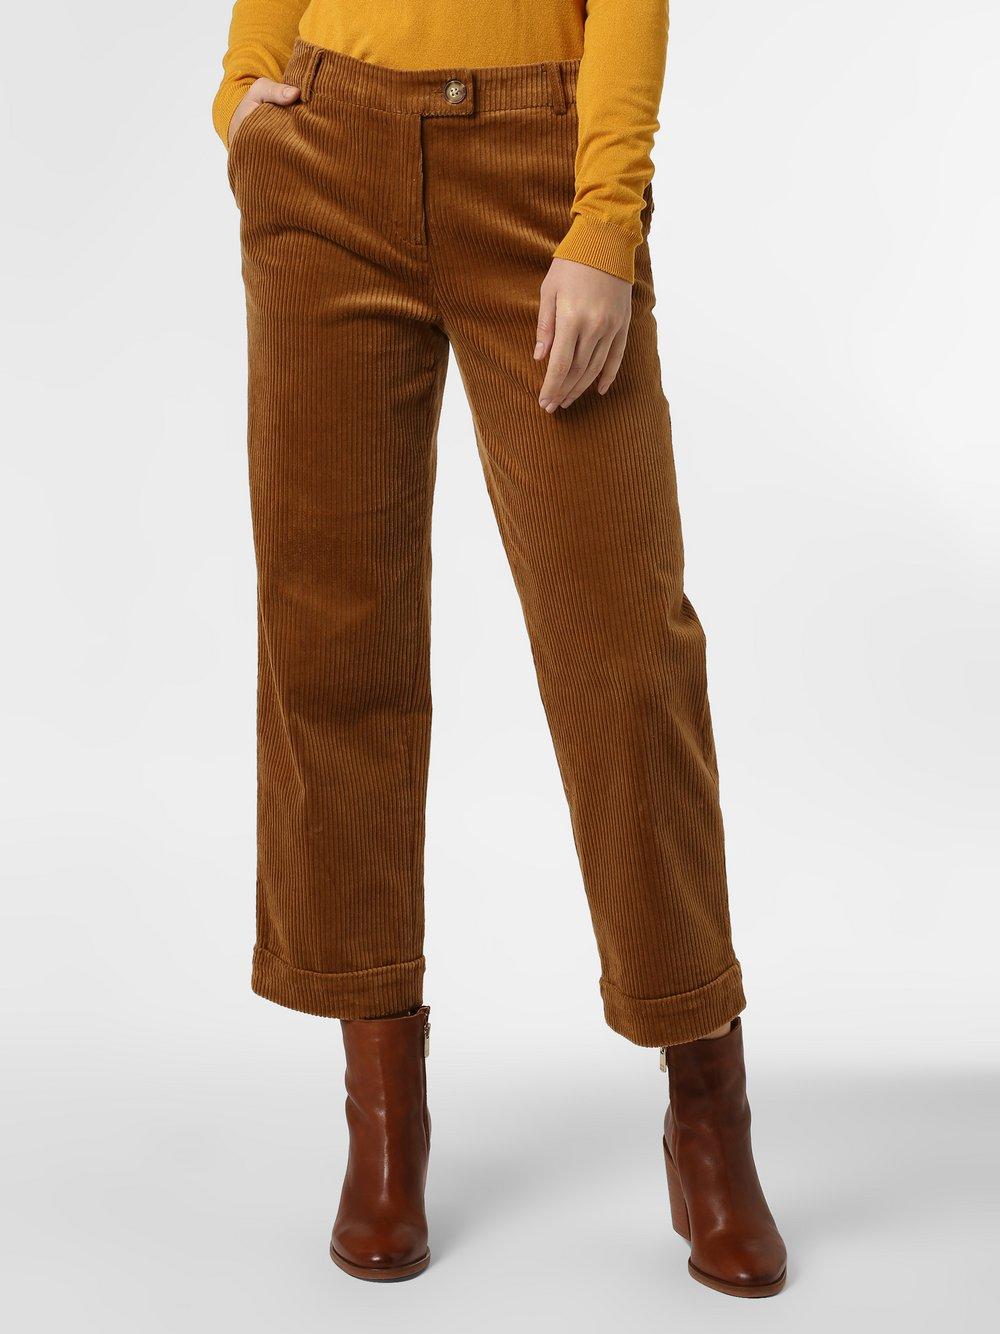 Someday - Spodnie damskie – Celli, beżowy